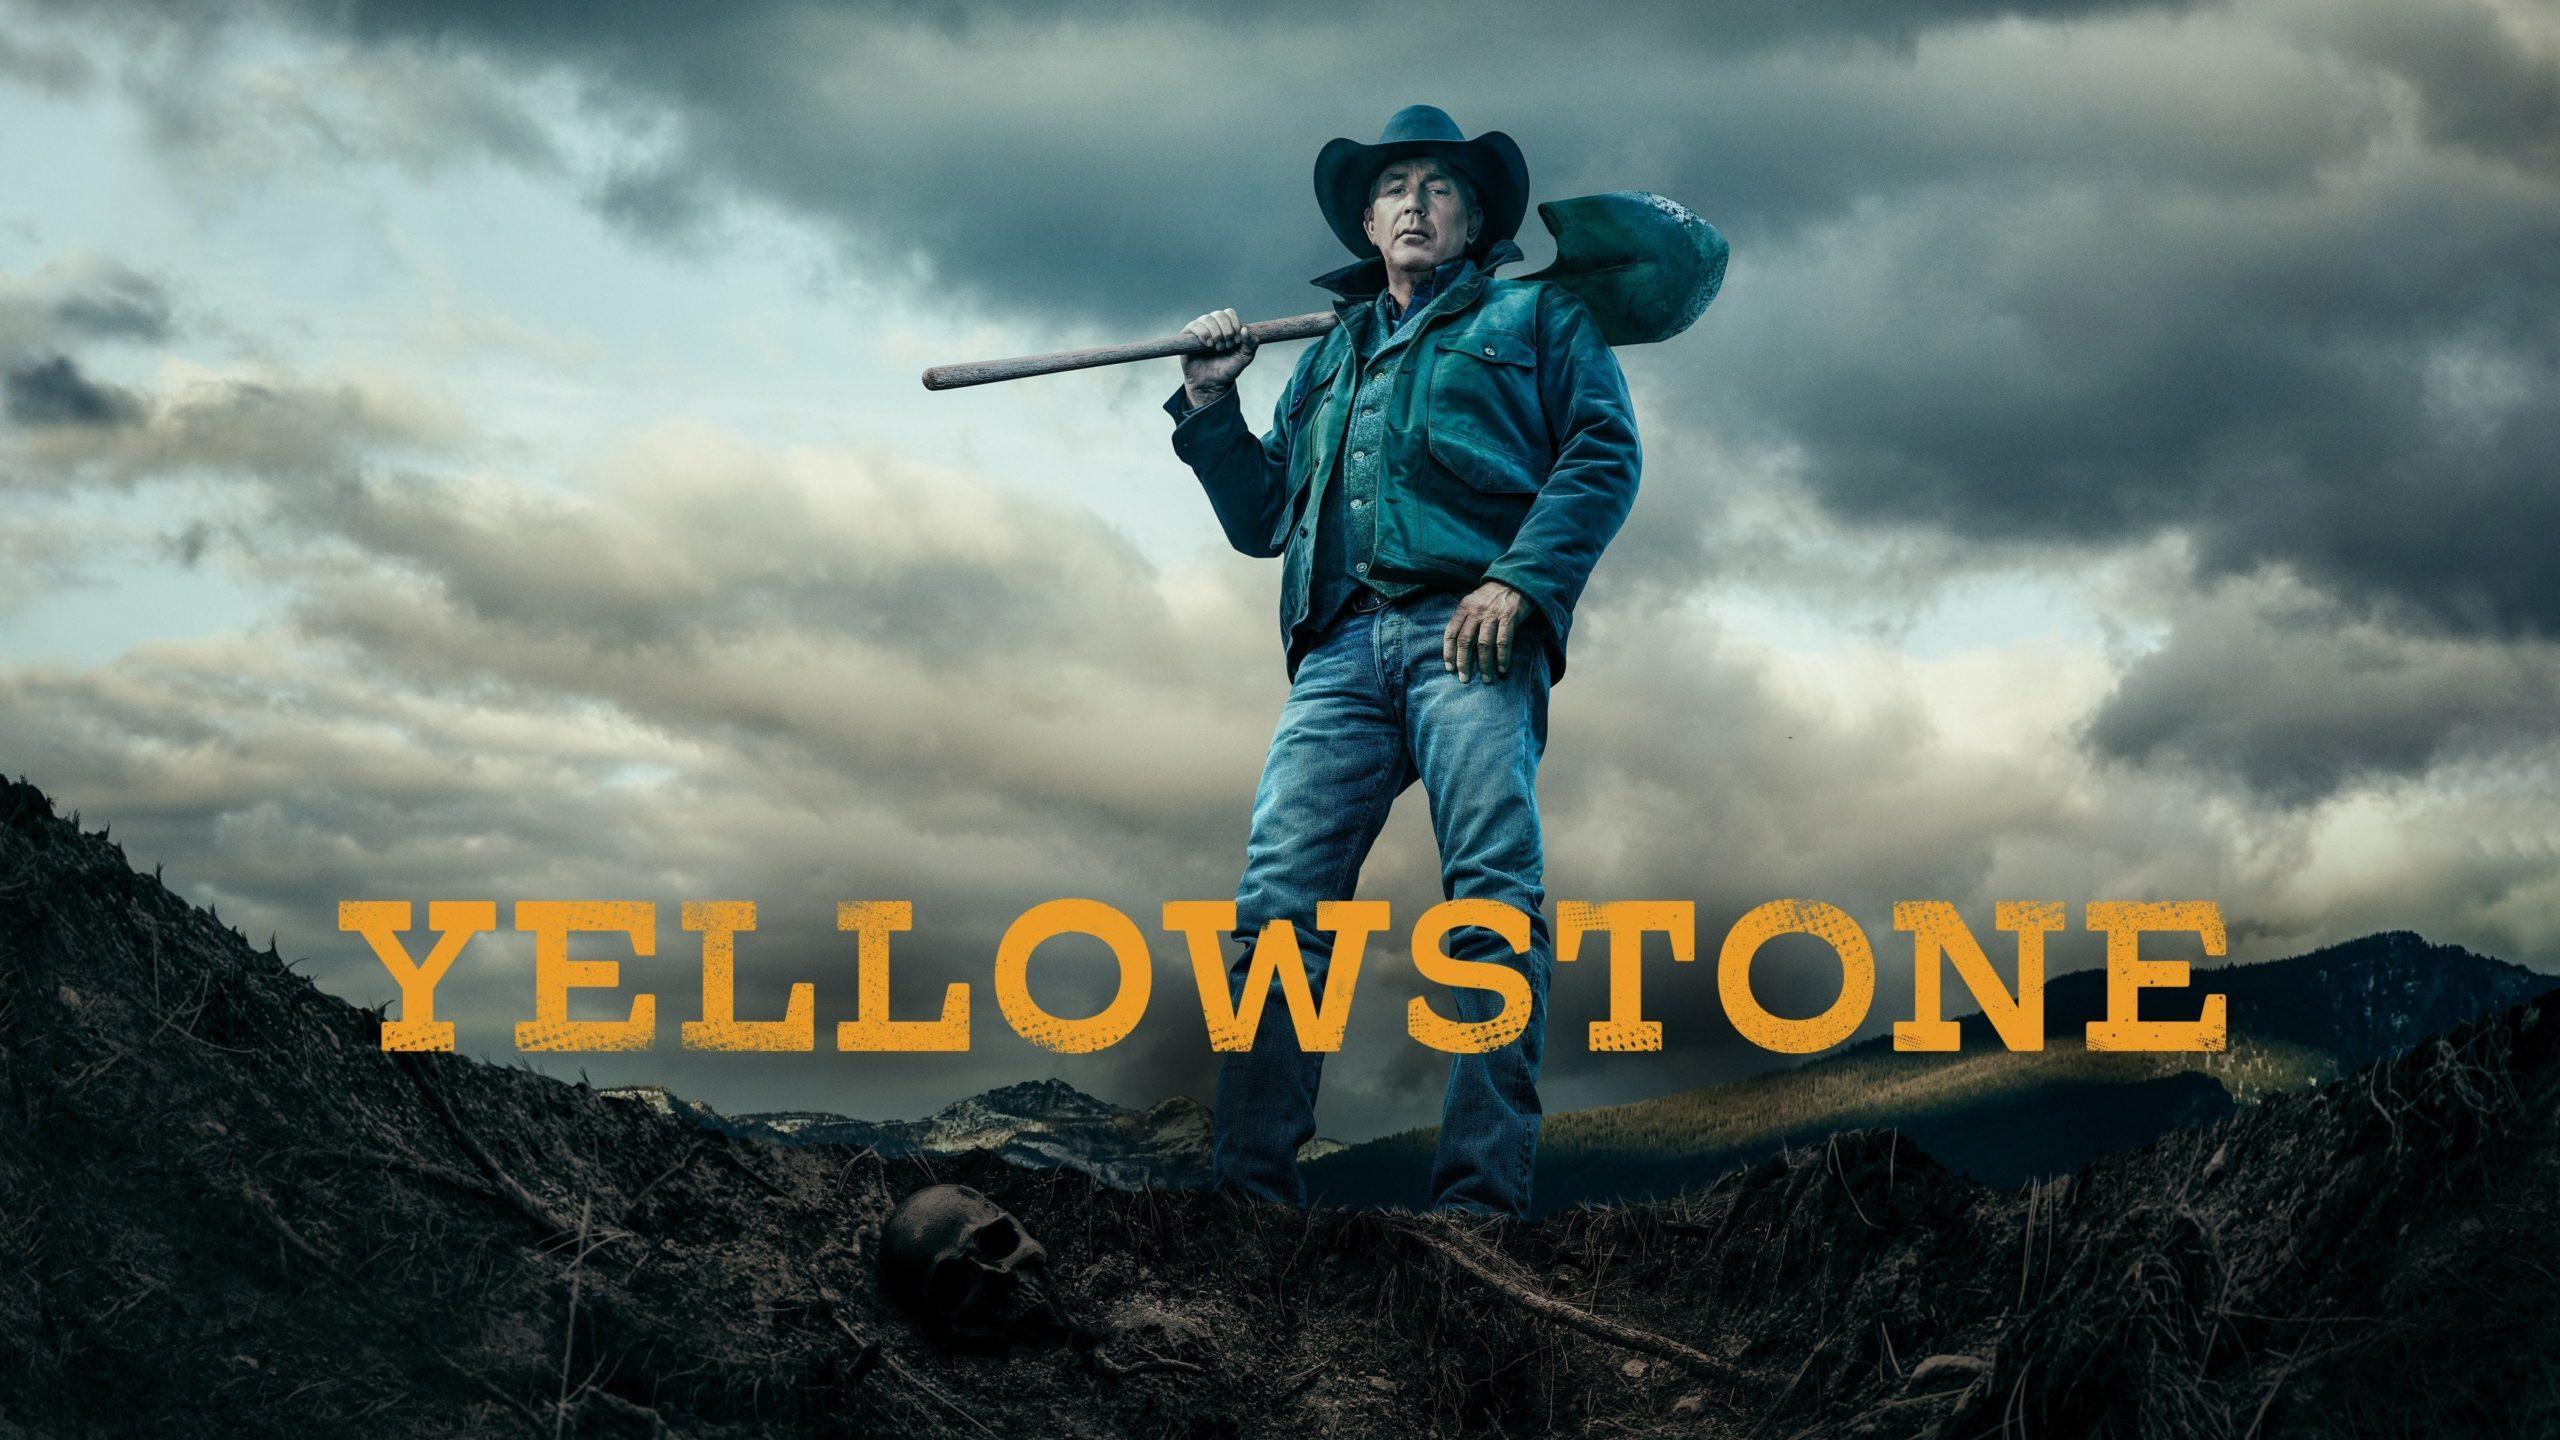 Yellowstone Season 3 Episode 5